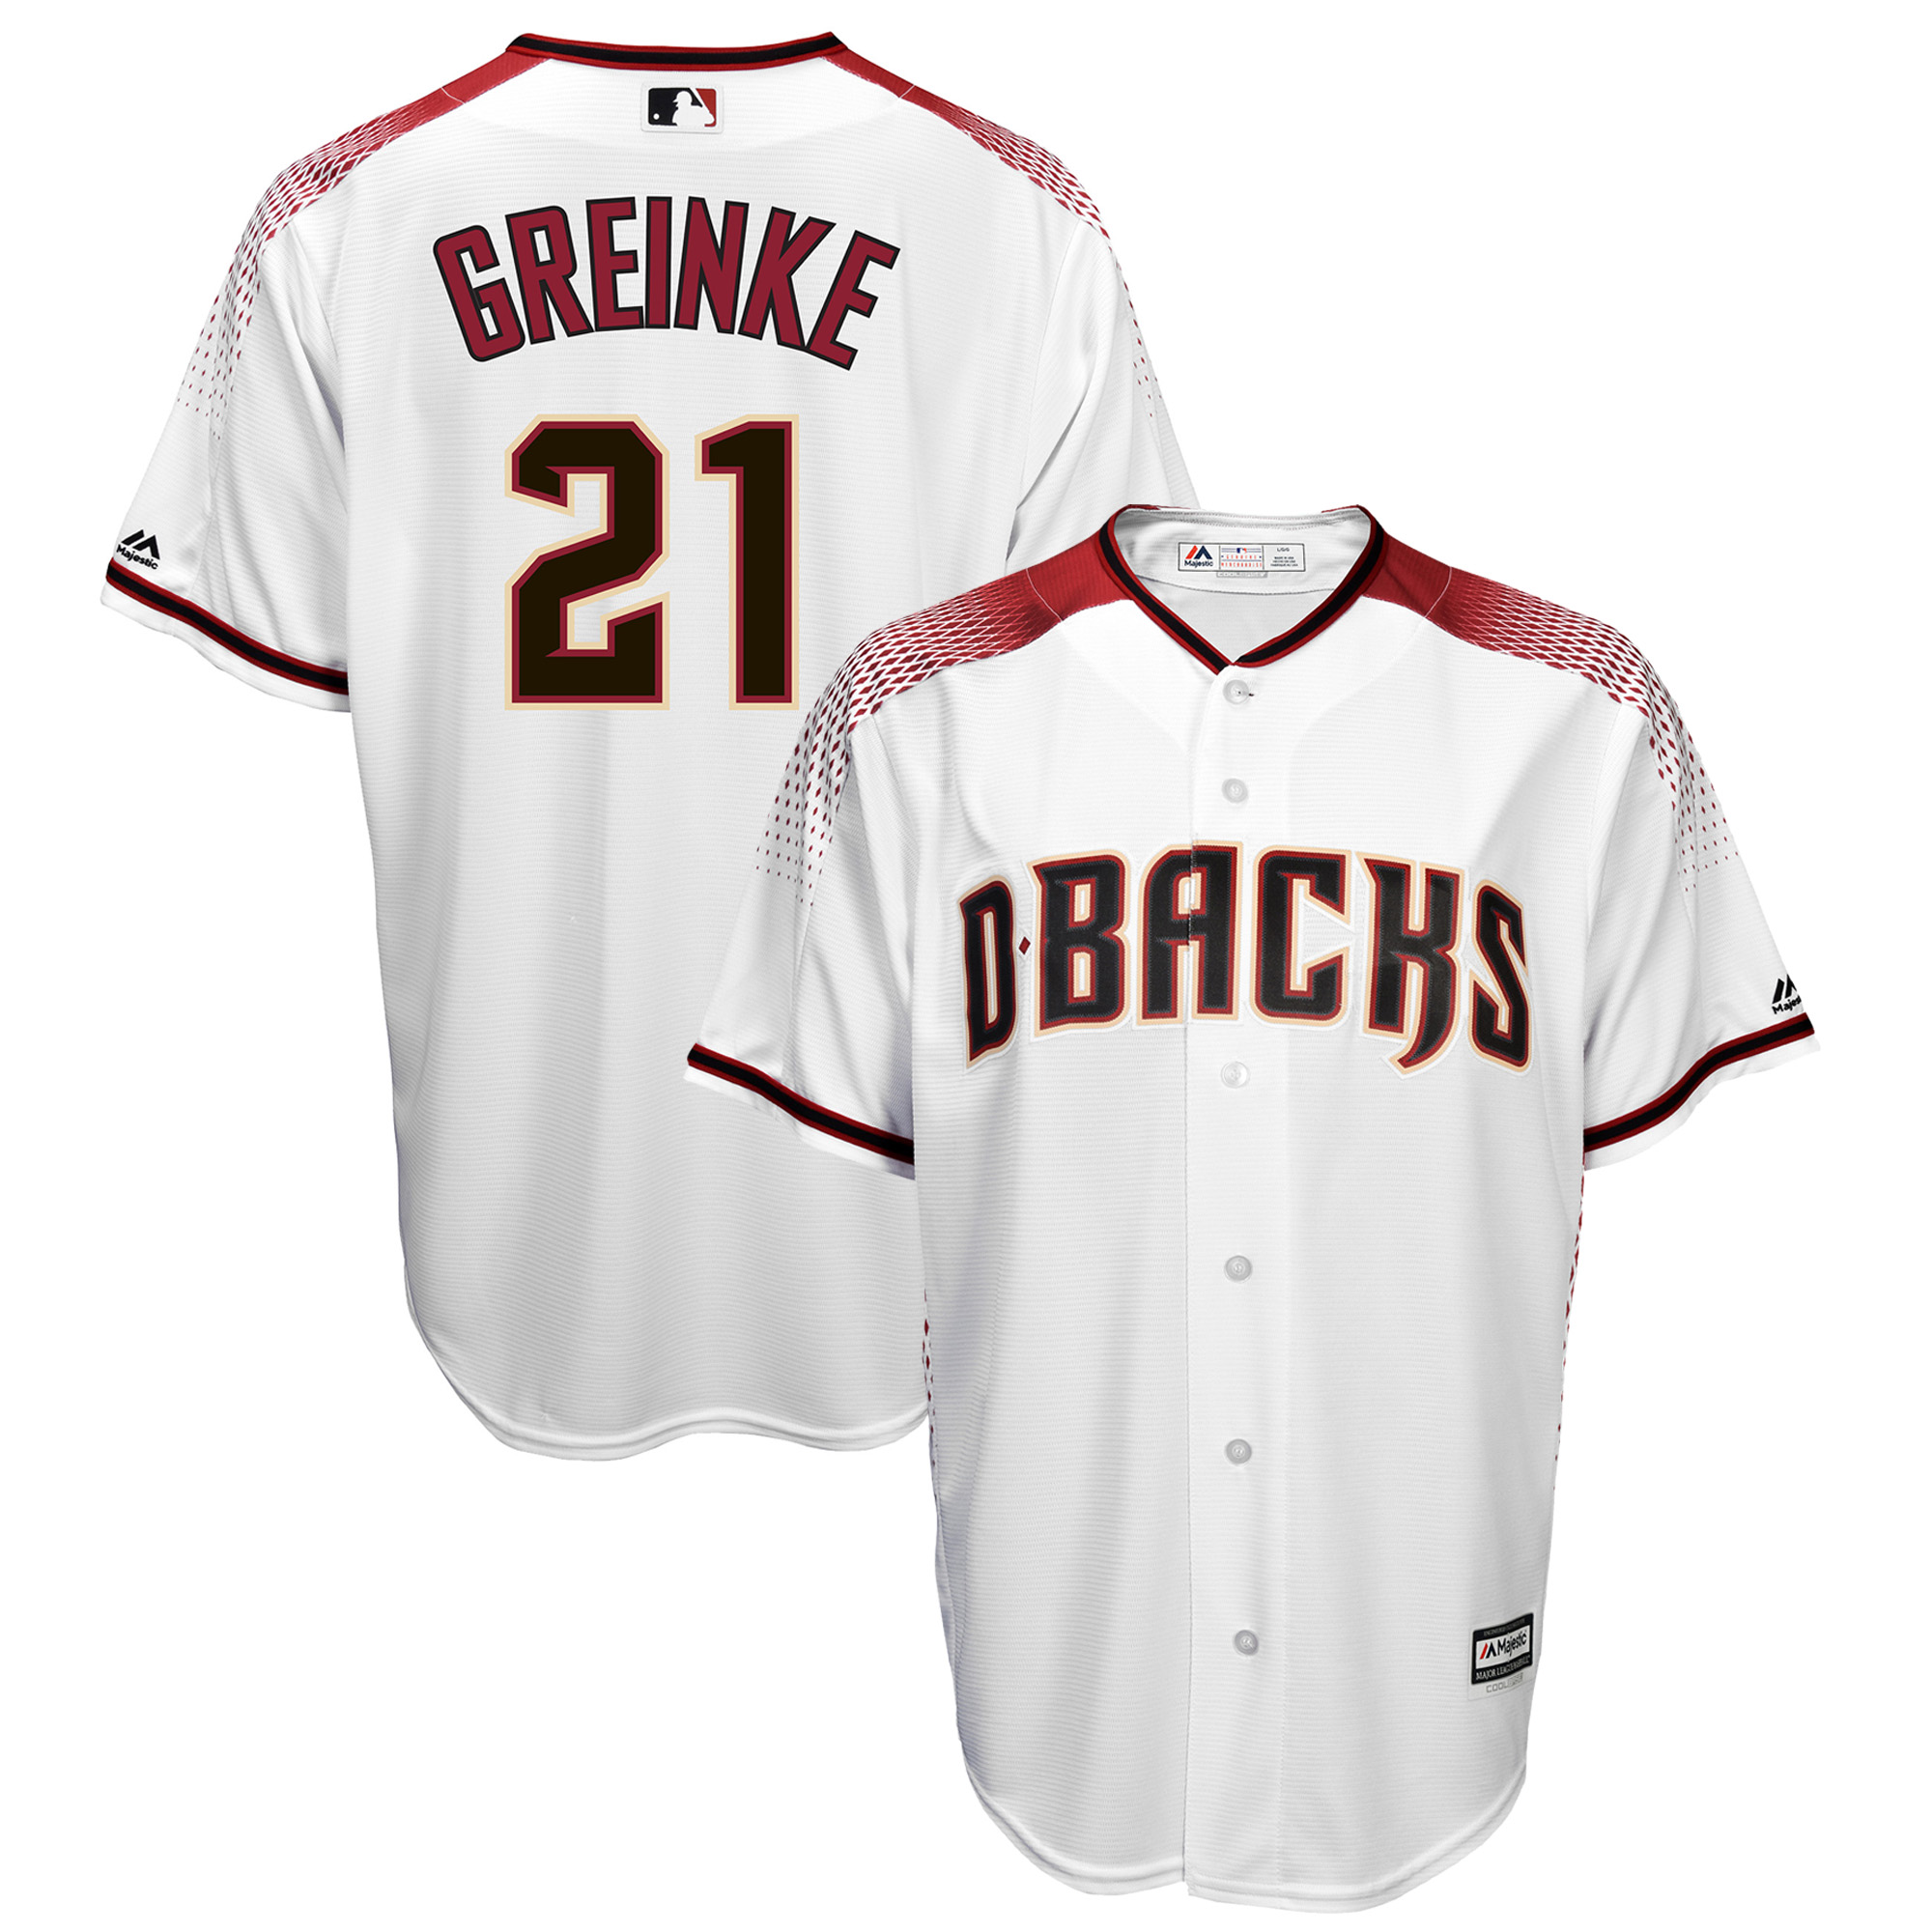 Zack Greinke Arizona Diamondbacks Majestic Official Cool Base Player Jersey - White/Sedona Red